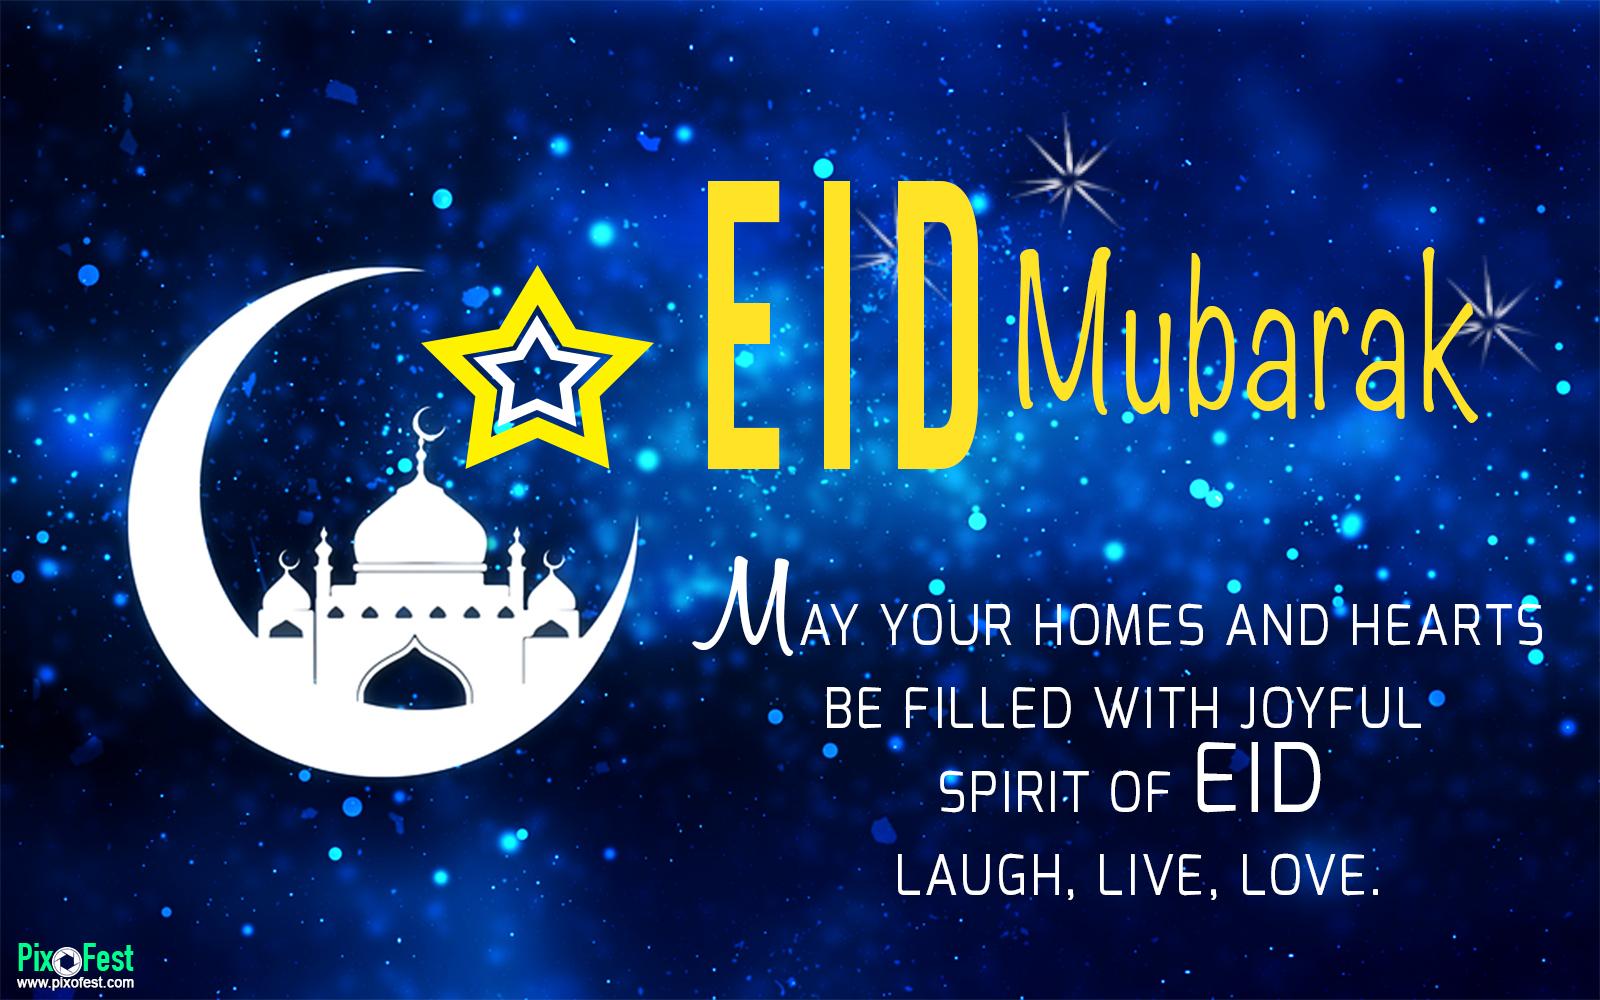 eidmubarak,eid,eidwish,eidquotes,eidalfitr,eidulfitr,eid mubarak,happyeid,eidi,happy_eid,EidSelfie,InstaEid,EidDay,EidOutfit,HappyEidMubarak,EidHoliday,EidParty,Family,Joyful,Celebration,Eidmubarakwallpaper,Eidwallpaper,Eidmubarakimage,Eidmubarakphoto,Pixofest